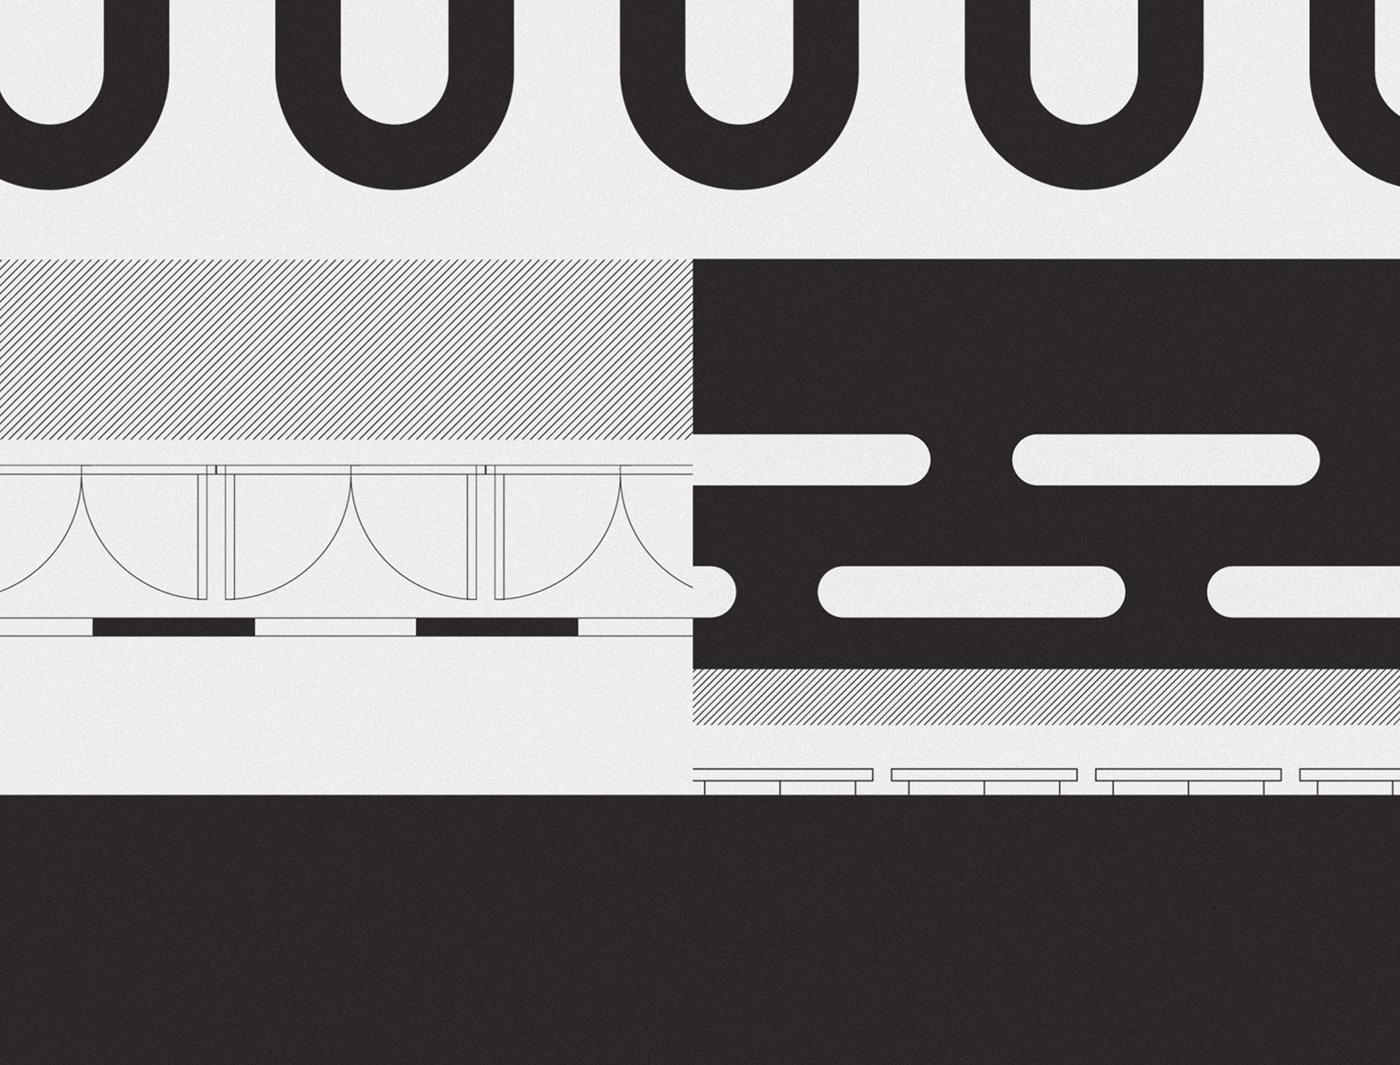 architecture print magazine book conceptual branding  minimal clean trendy